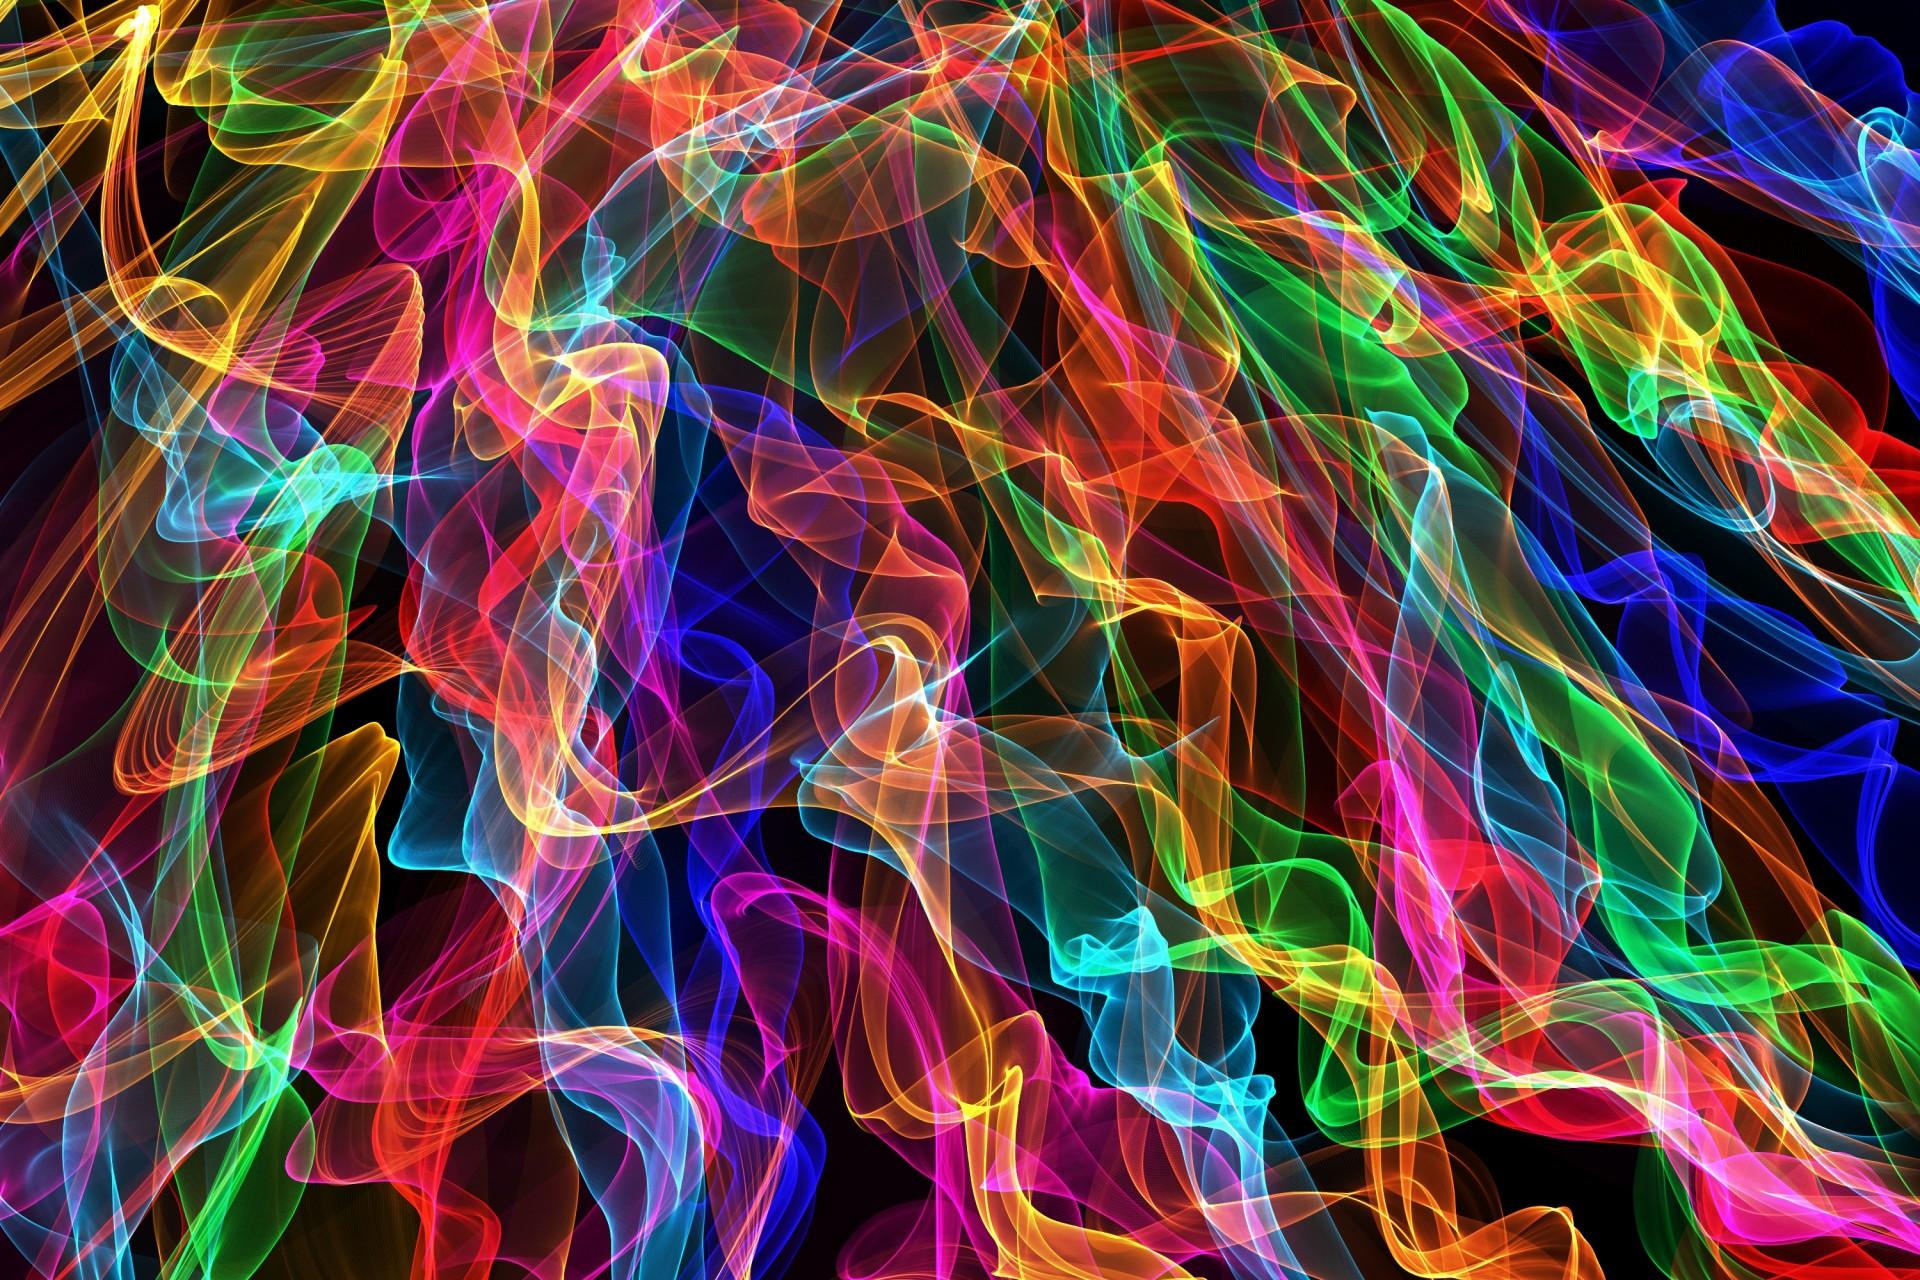 rainbow-ribbon-flames.jpg